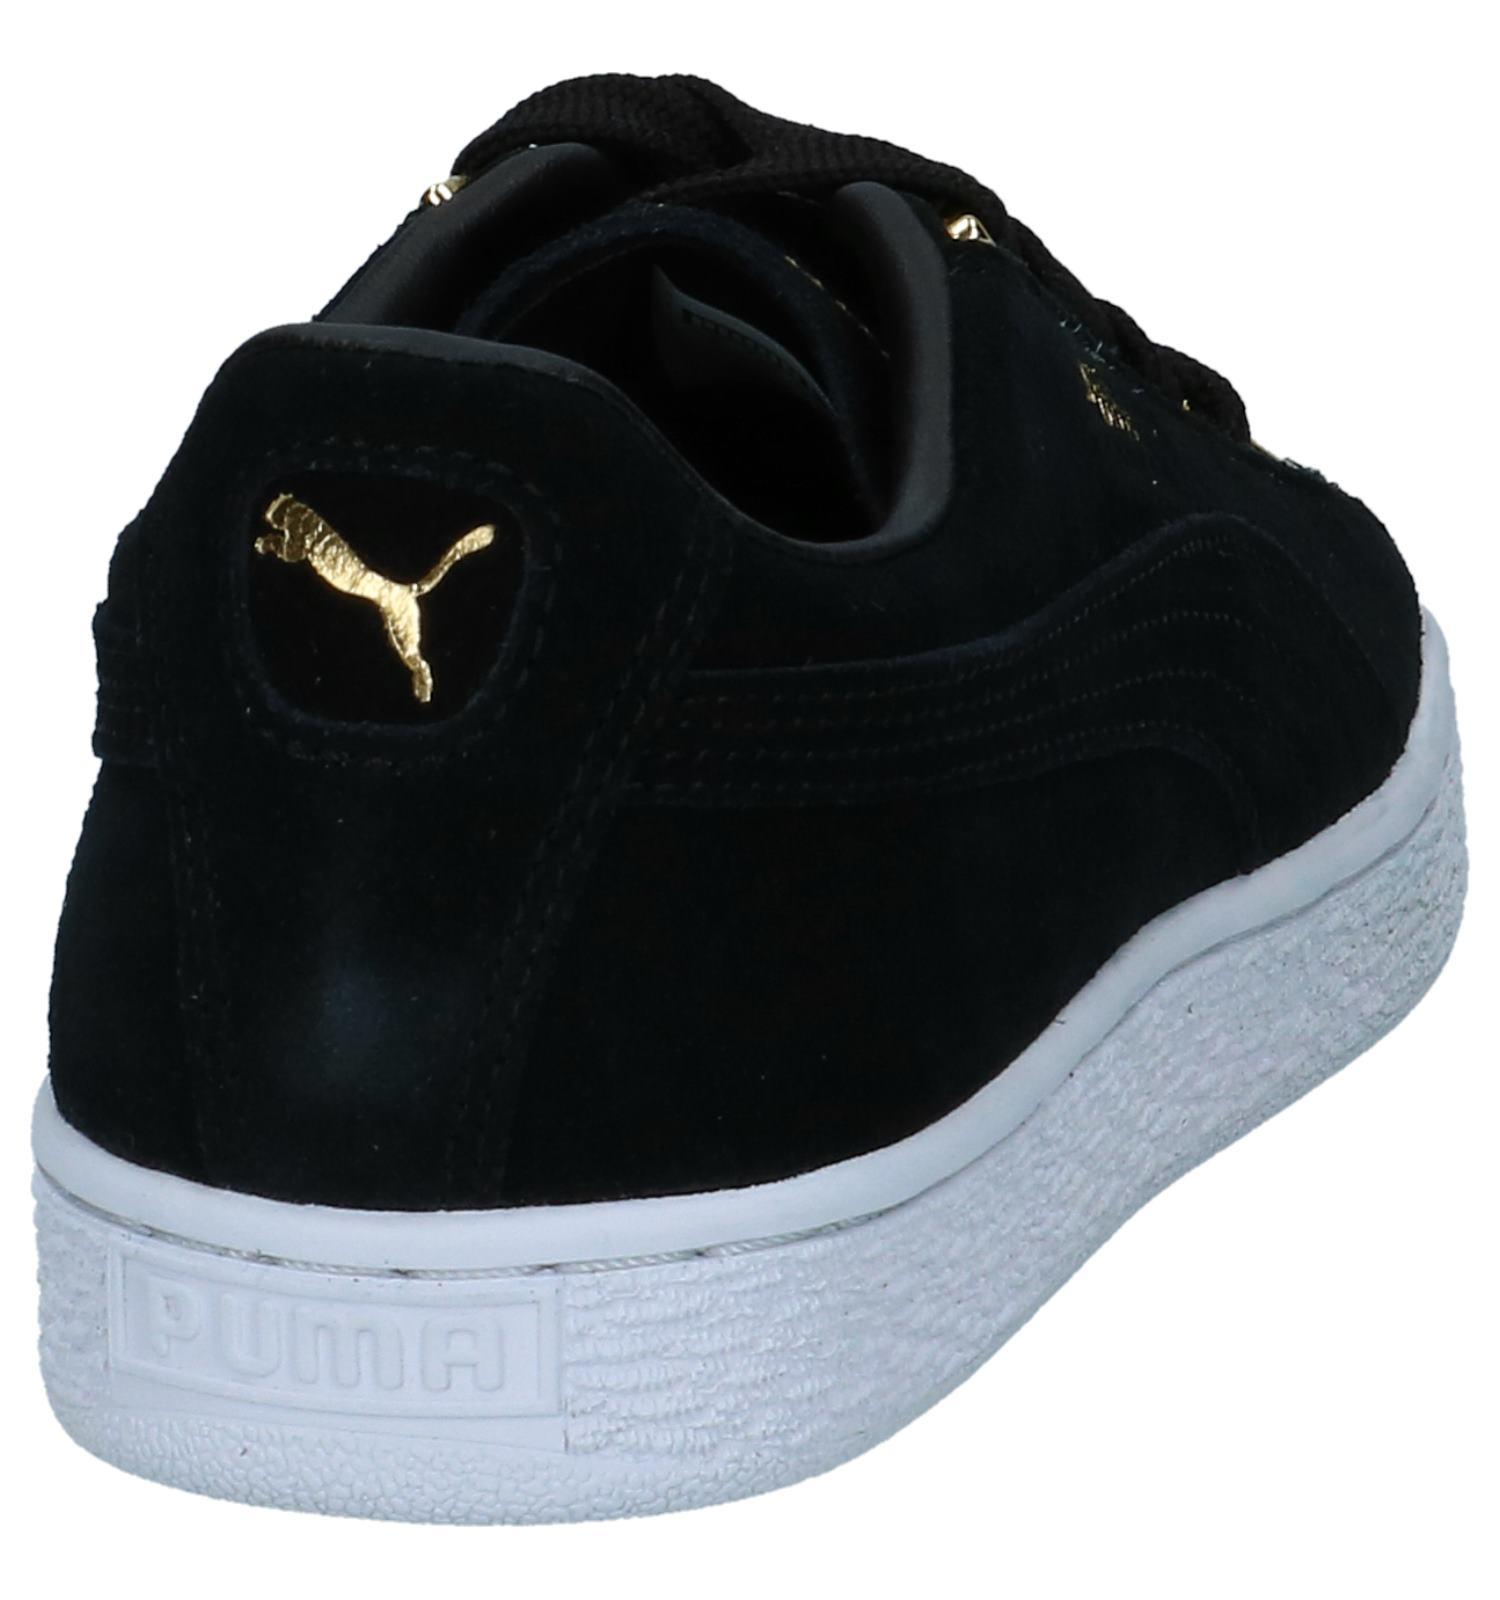 Suede Jewel Sneakers Puma Puma Puma Zwarte Sneakers Jewel Jewel Suede Suede Zwarte lJFKT1c